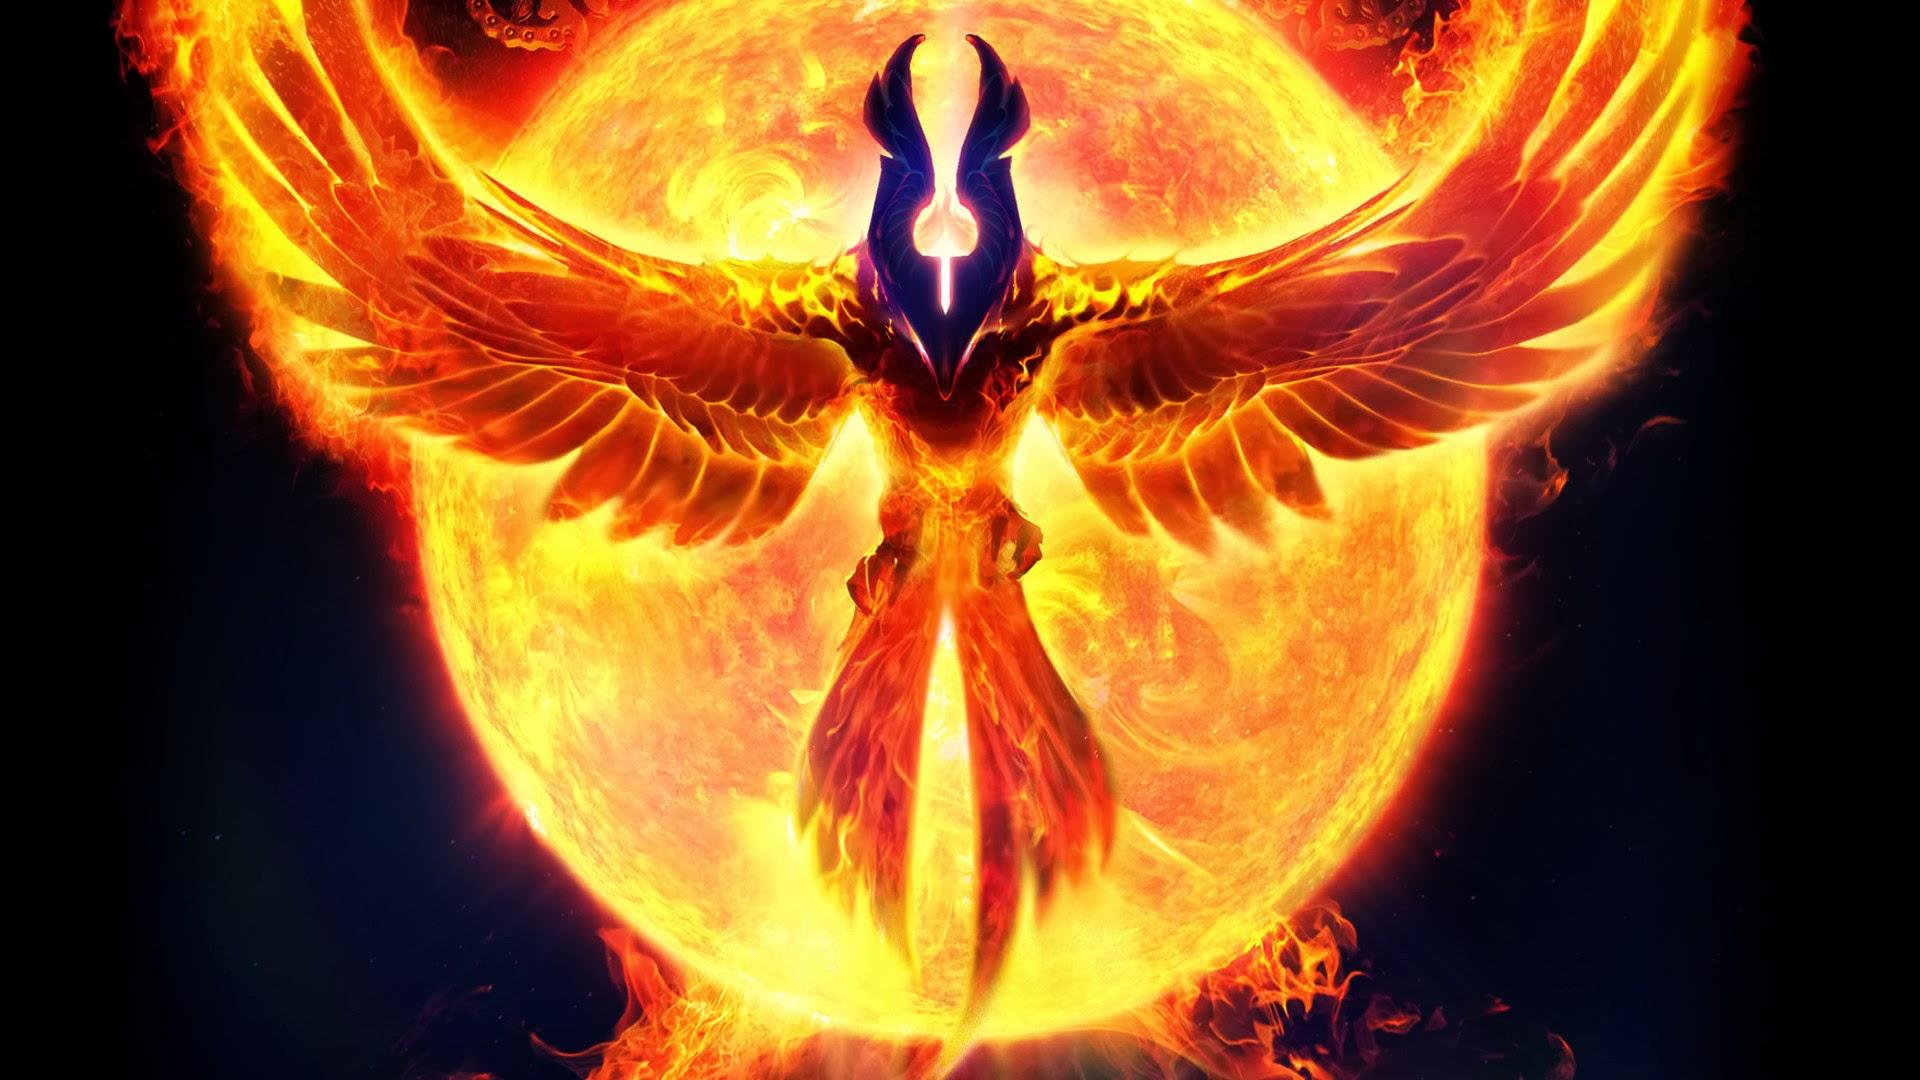 phoenix wallpaper hd - photo #4